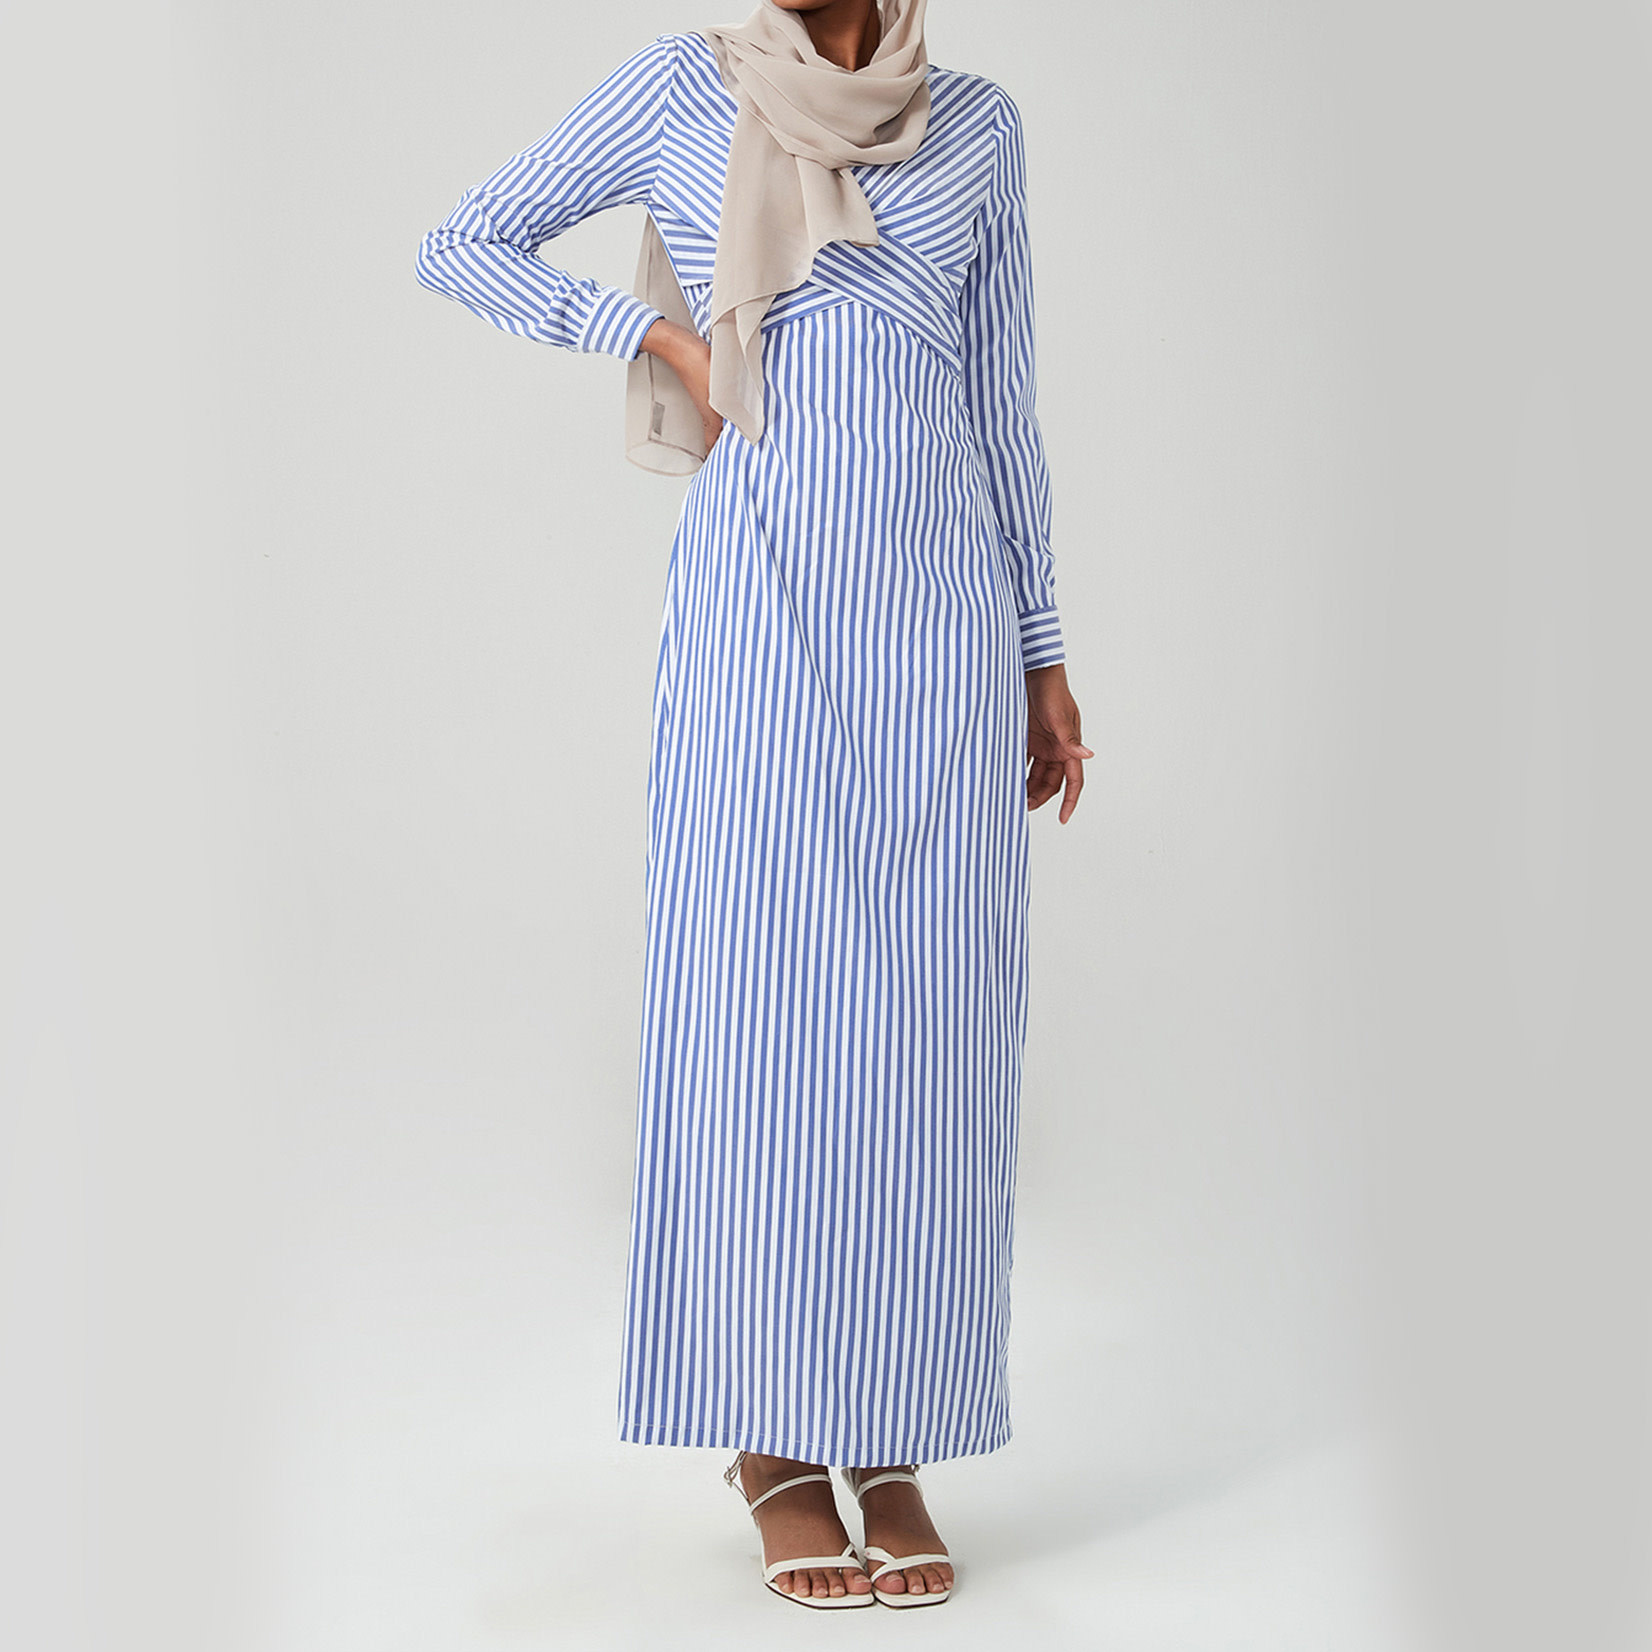 Hijab House Stripe Wrap Dress